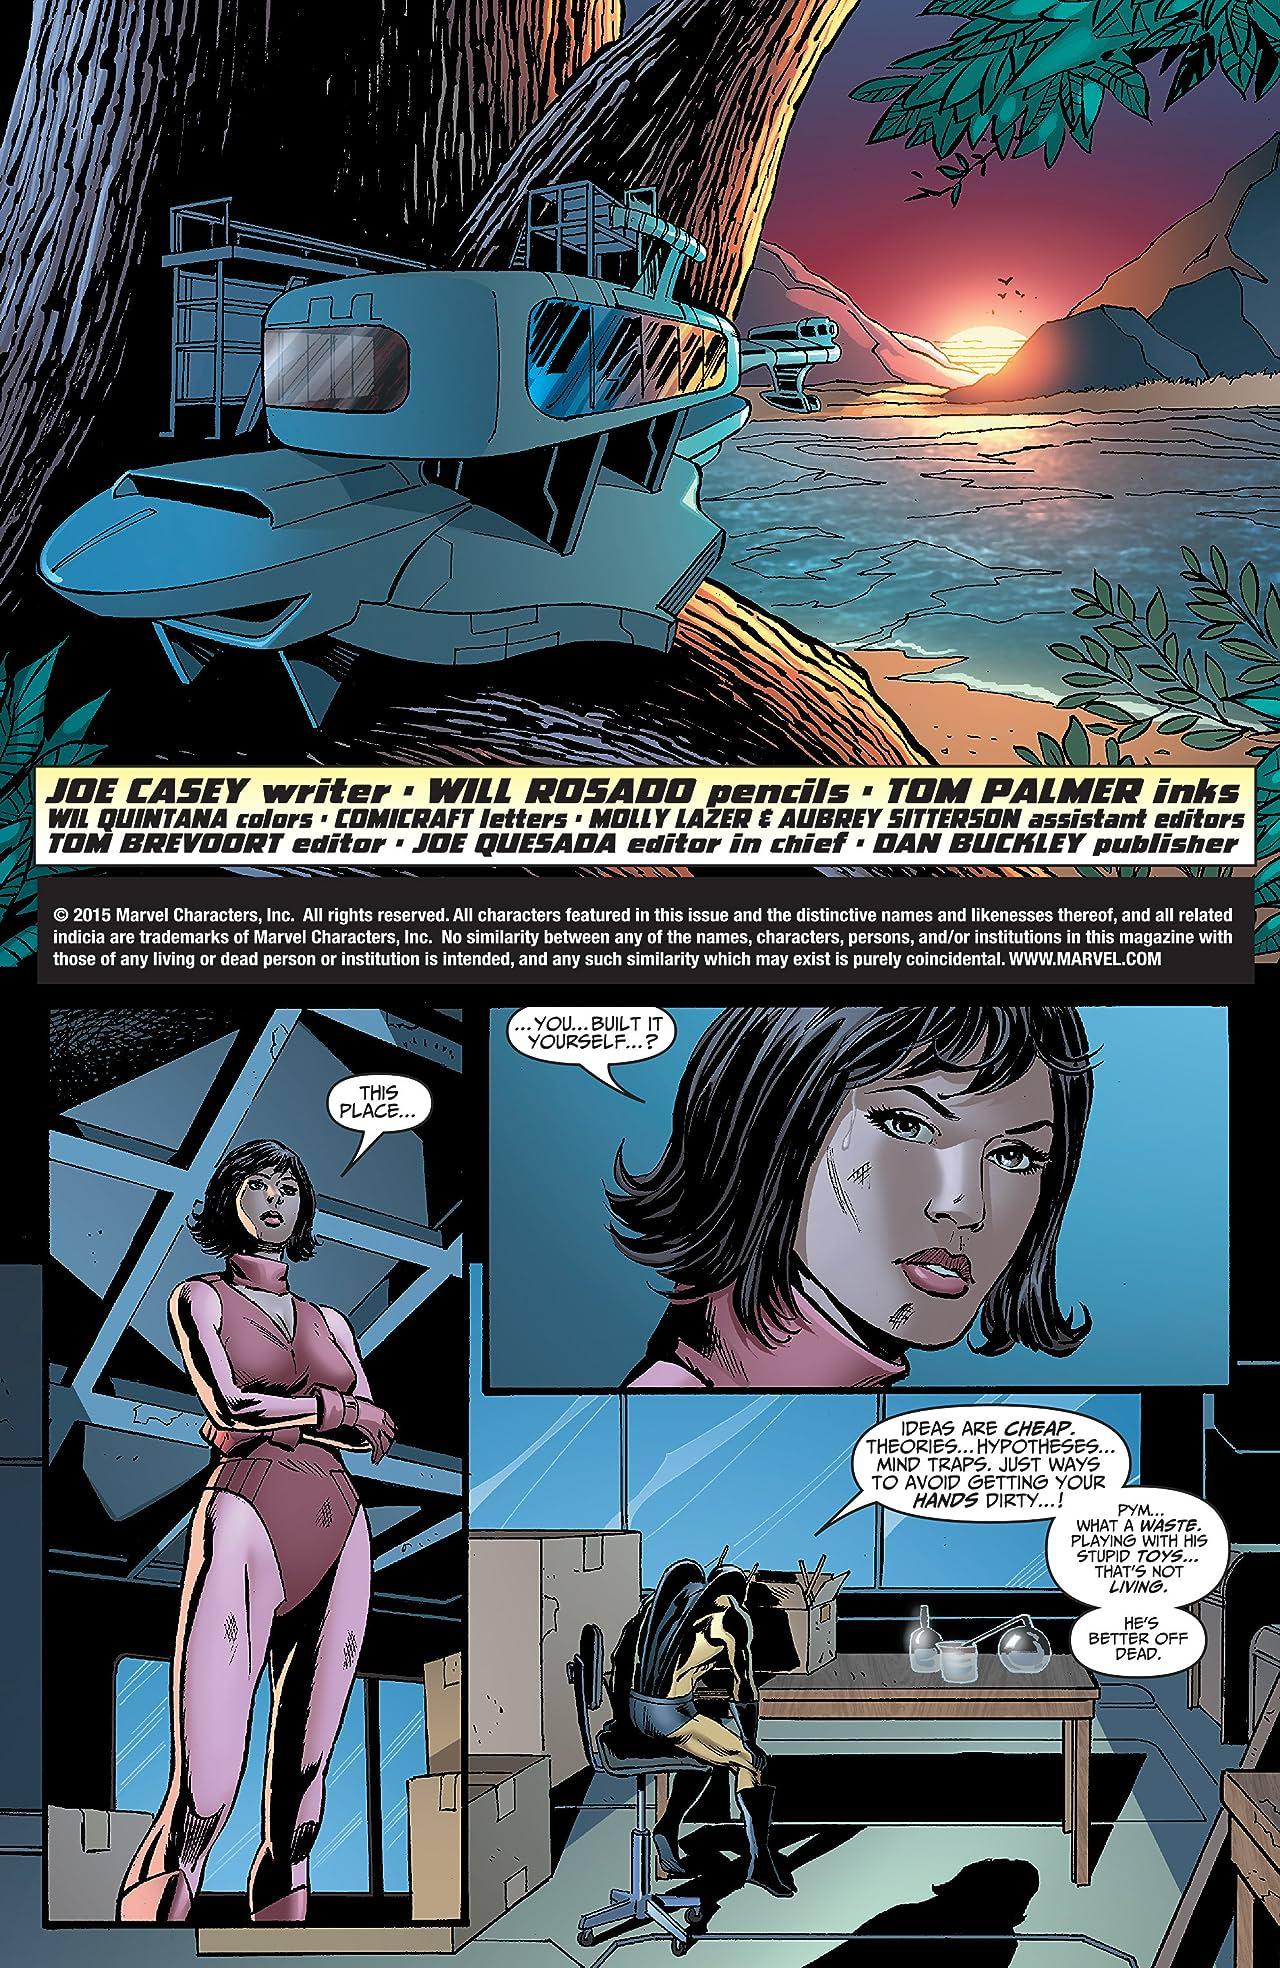 Avengers: Earth's Mightiest Heroes II (2006-2007) #6 (of 8)